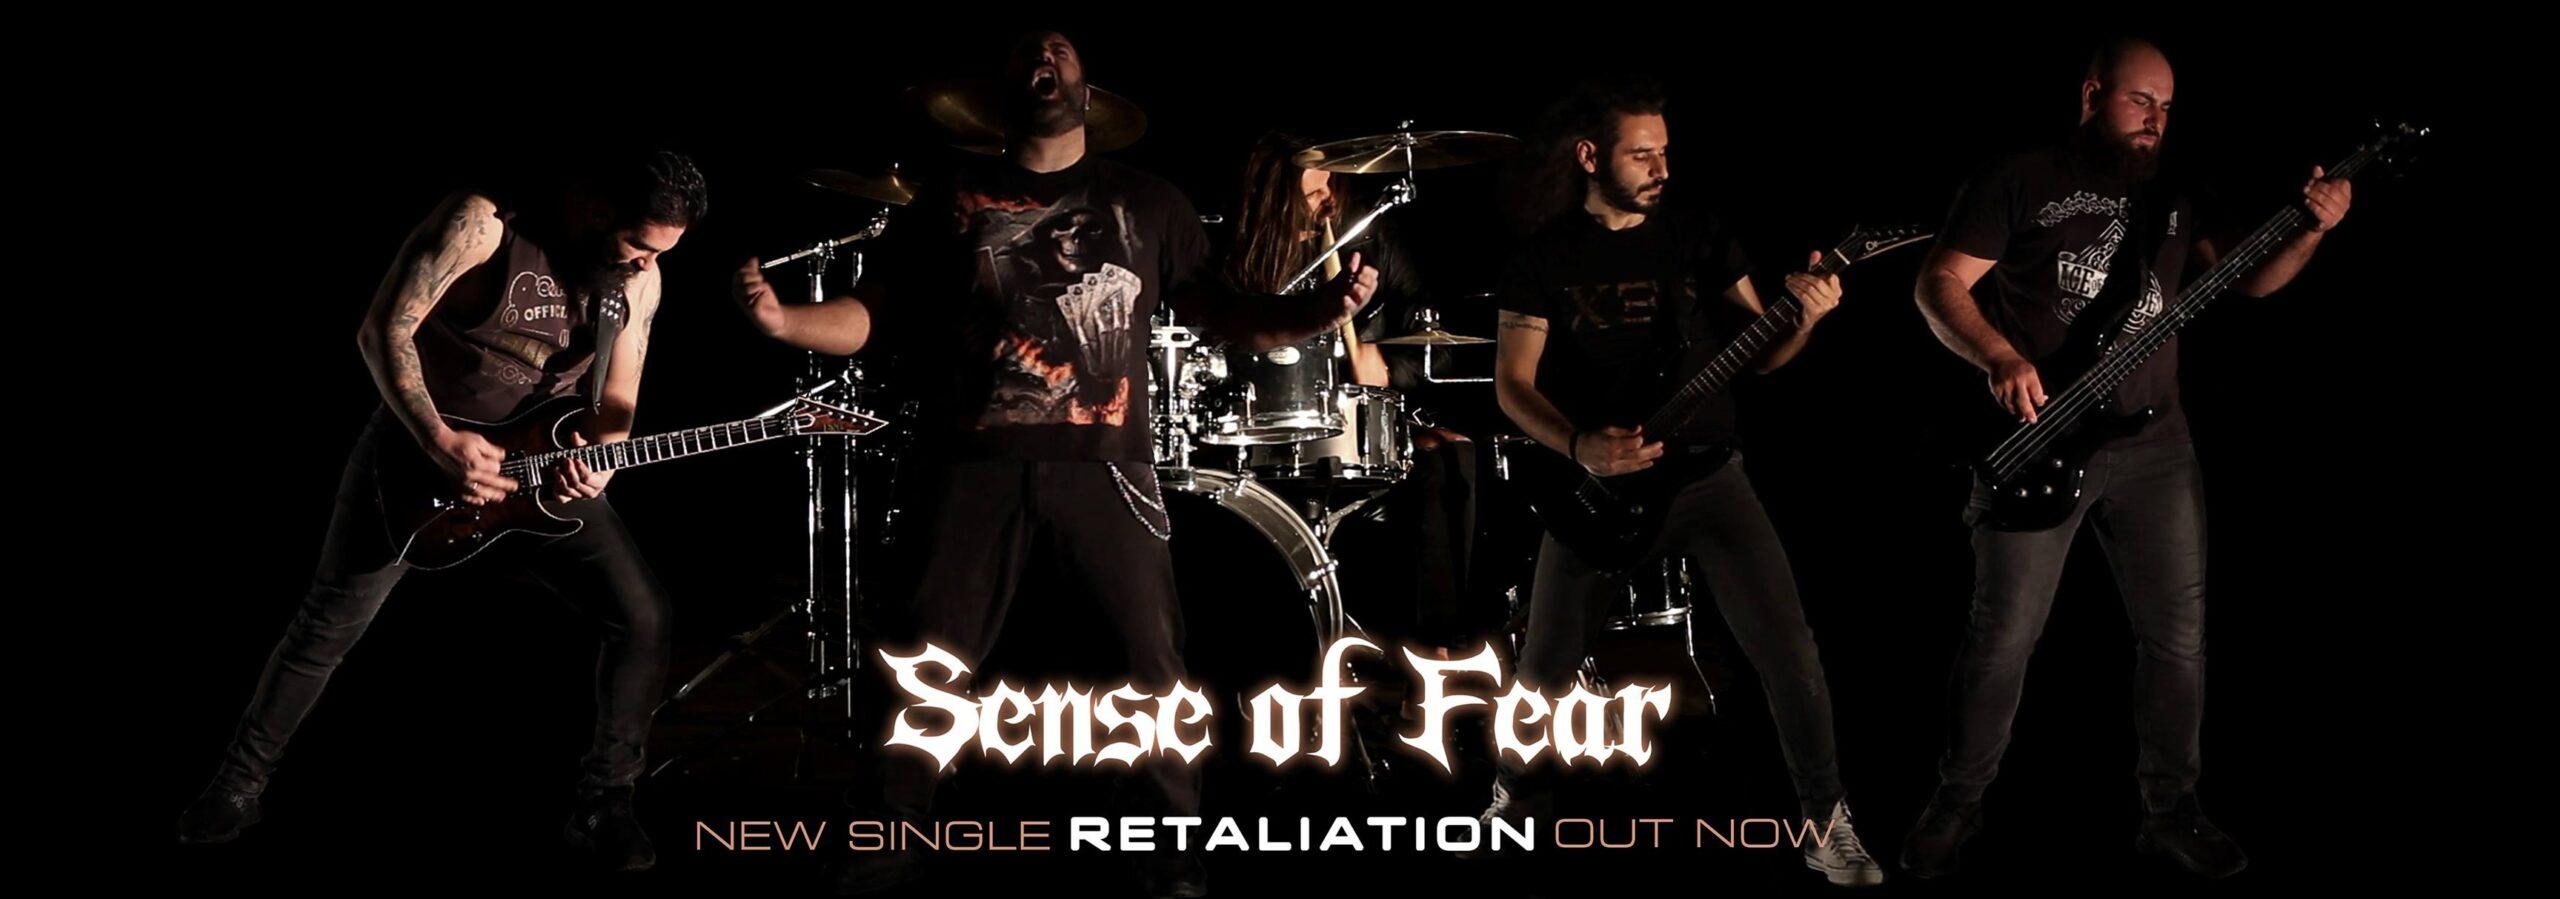 Sense of Fear - New single Retaliation